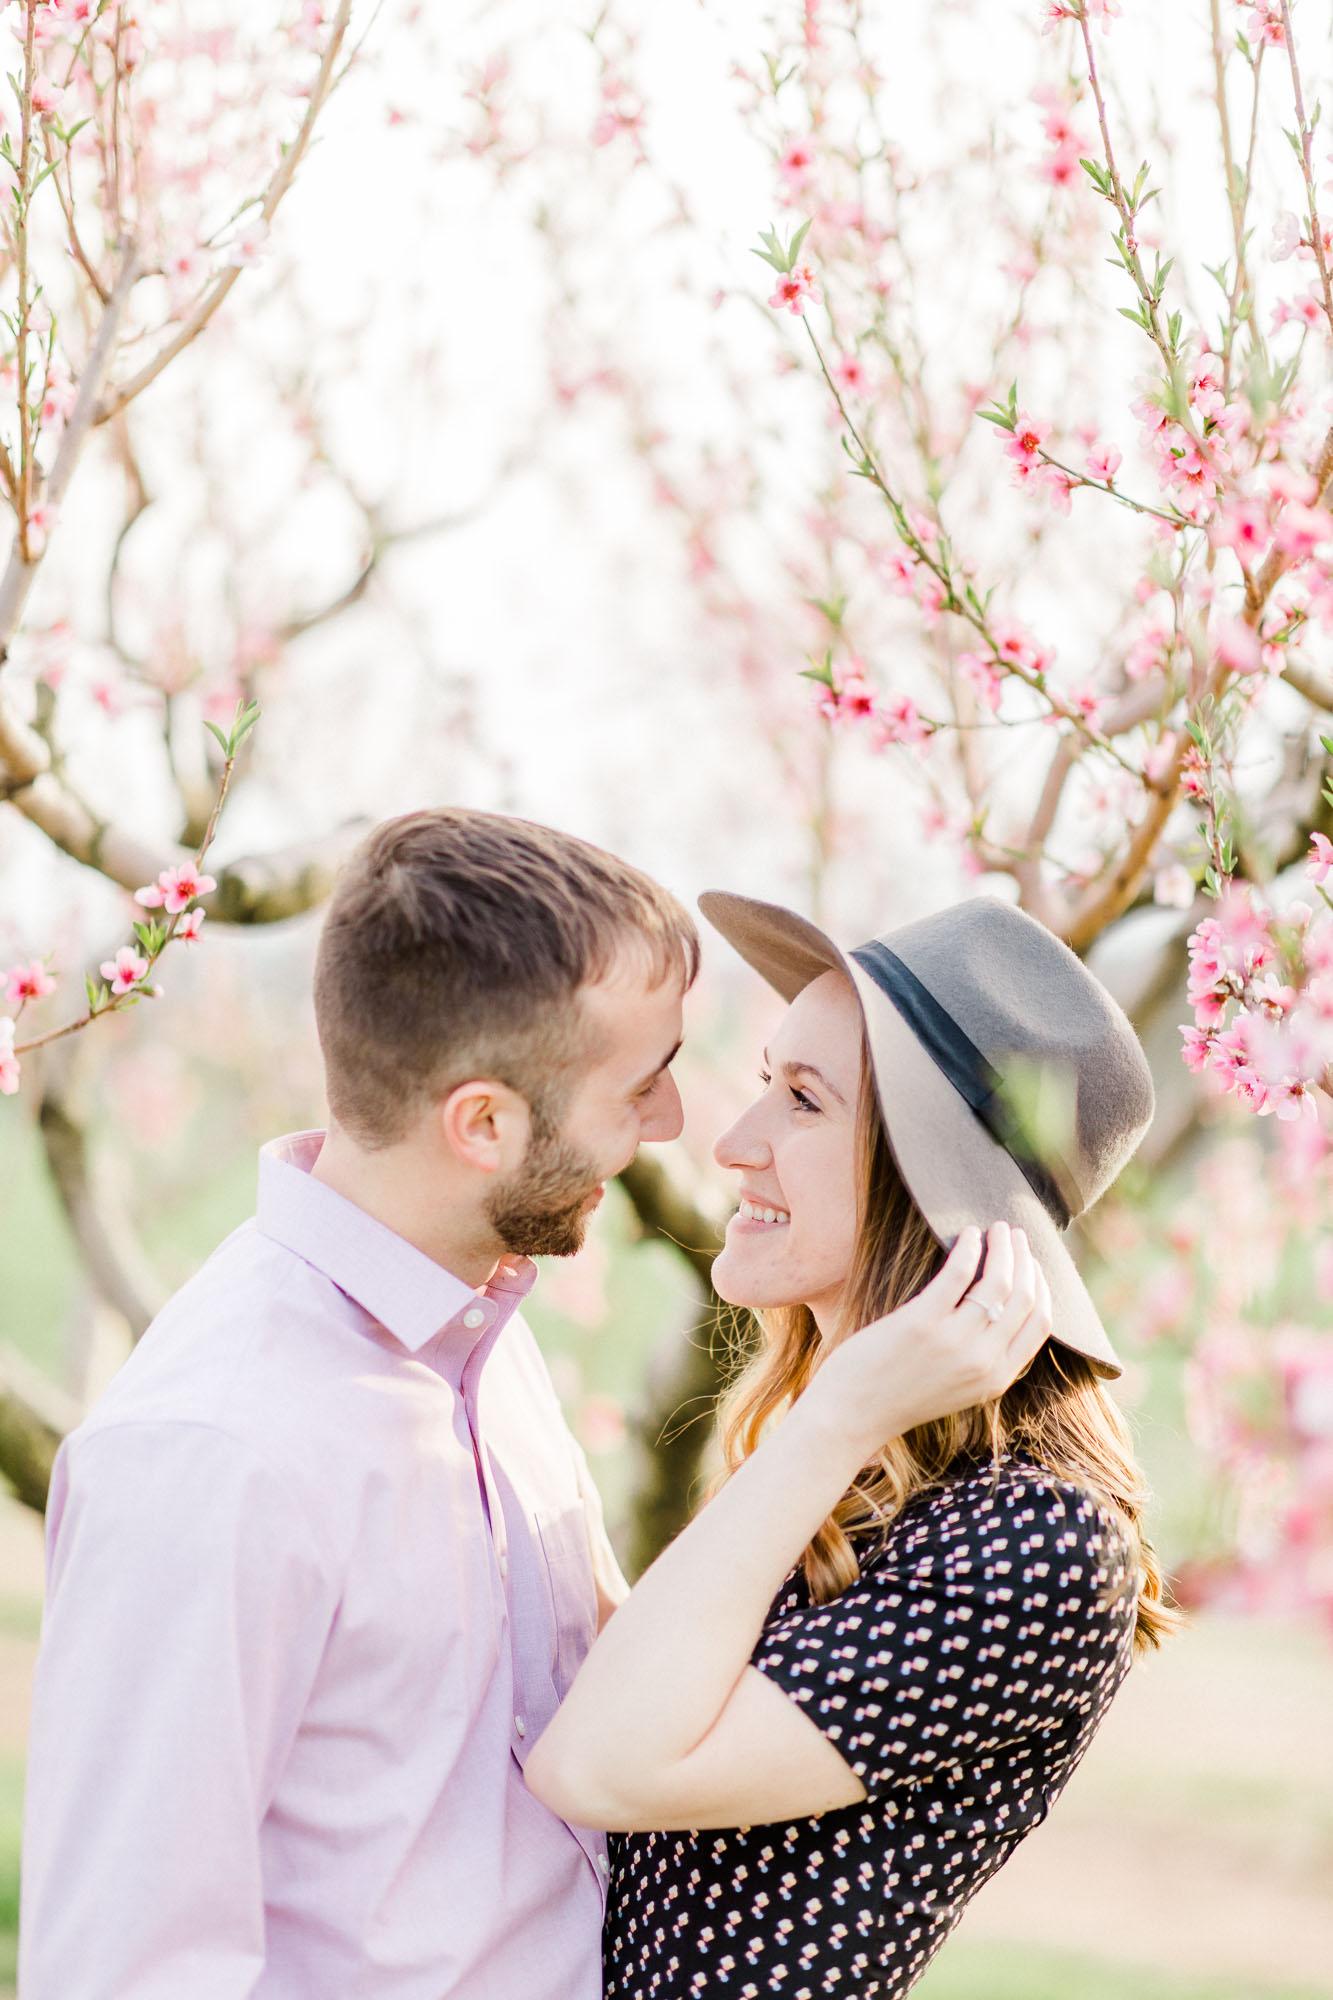 Rohrbachs-Spring-cherry-blossom-engagement-7492.jpg